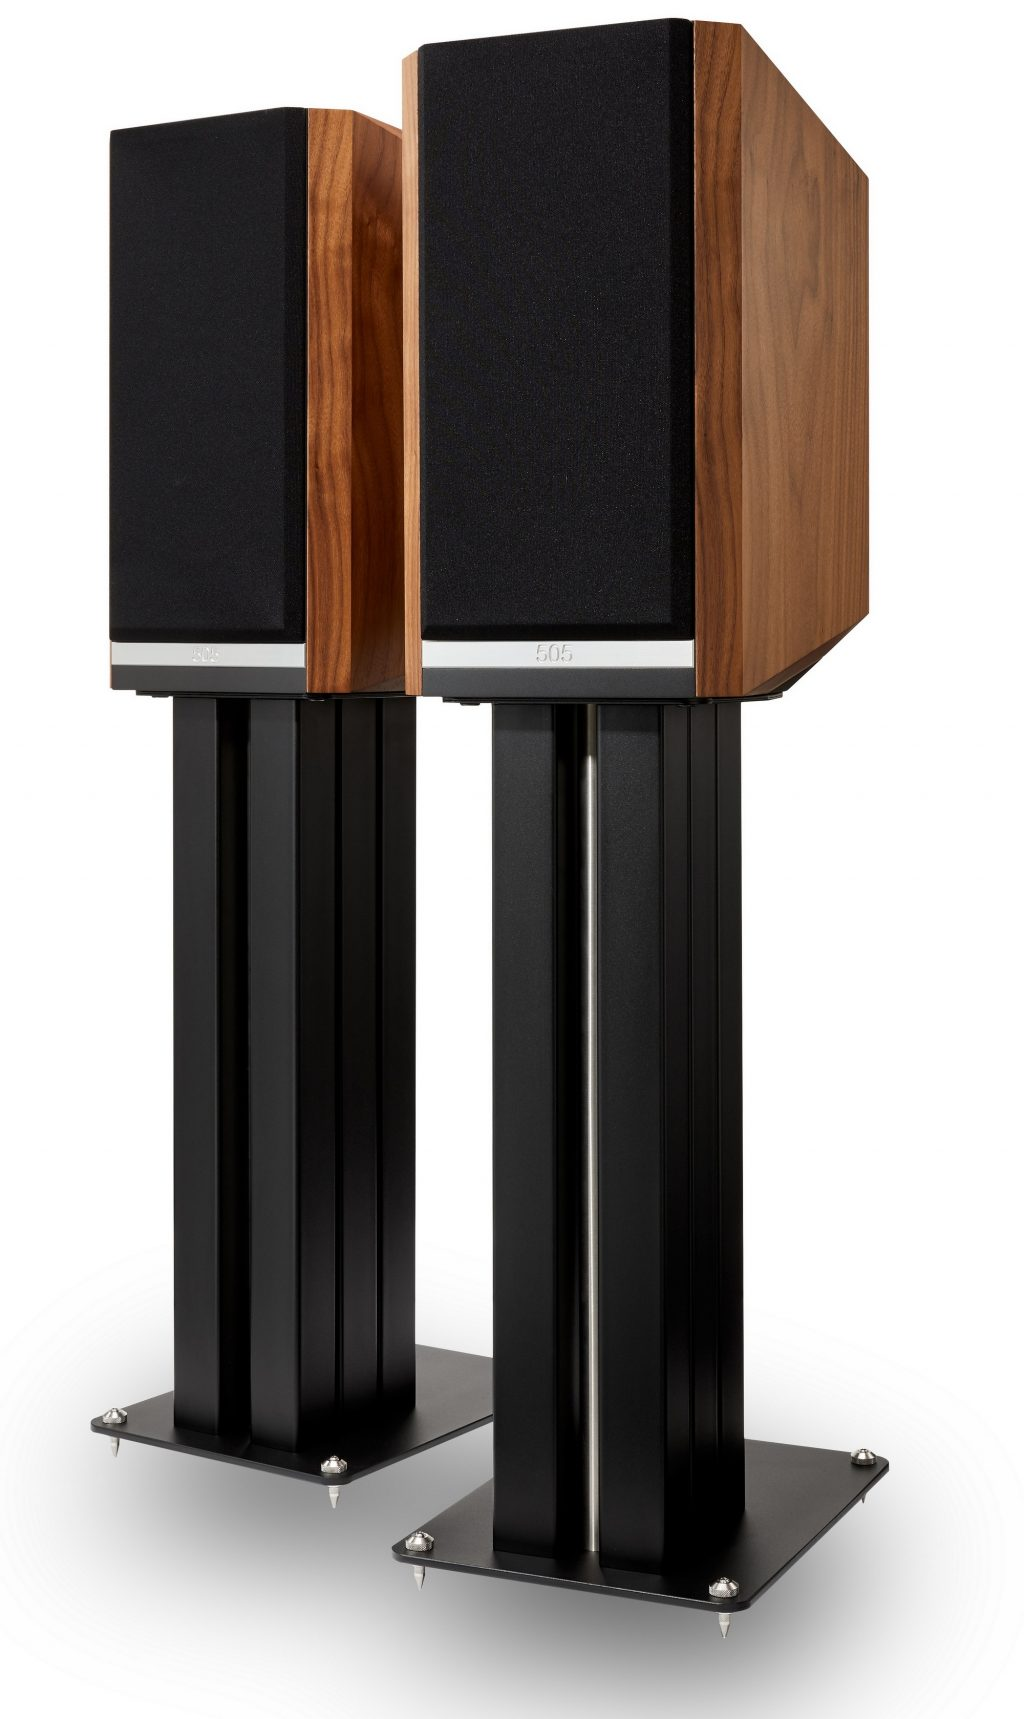 Kudos Titan 505 Loudspeakers